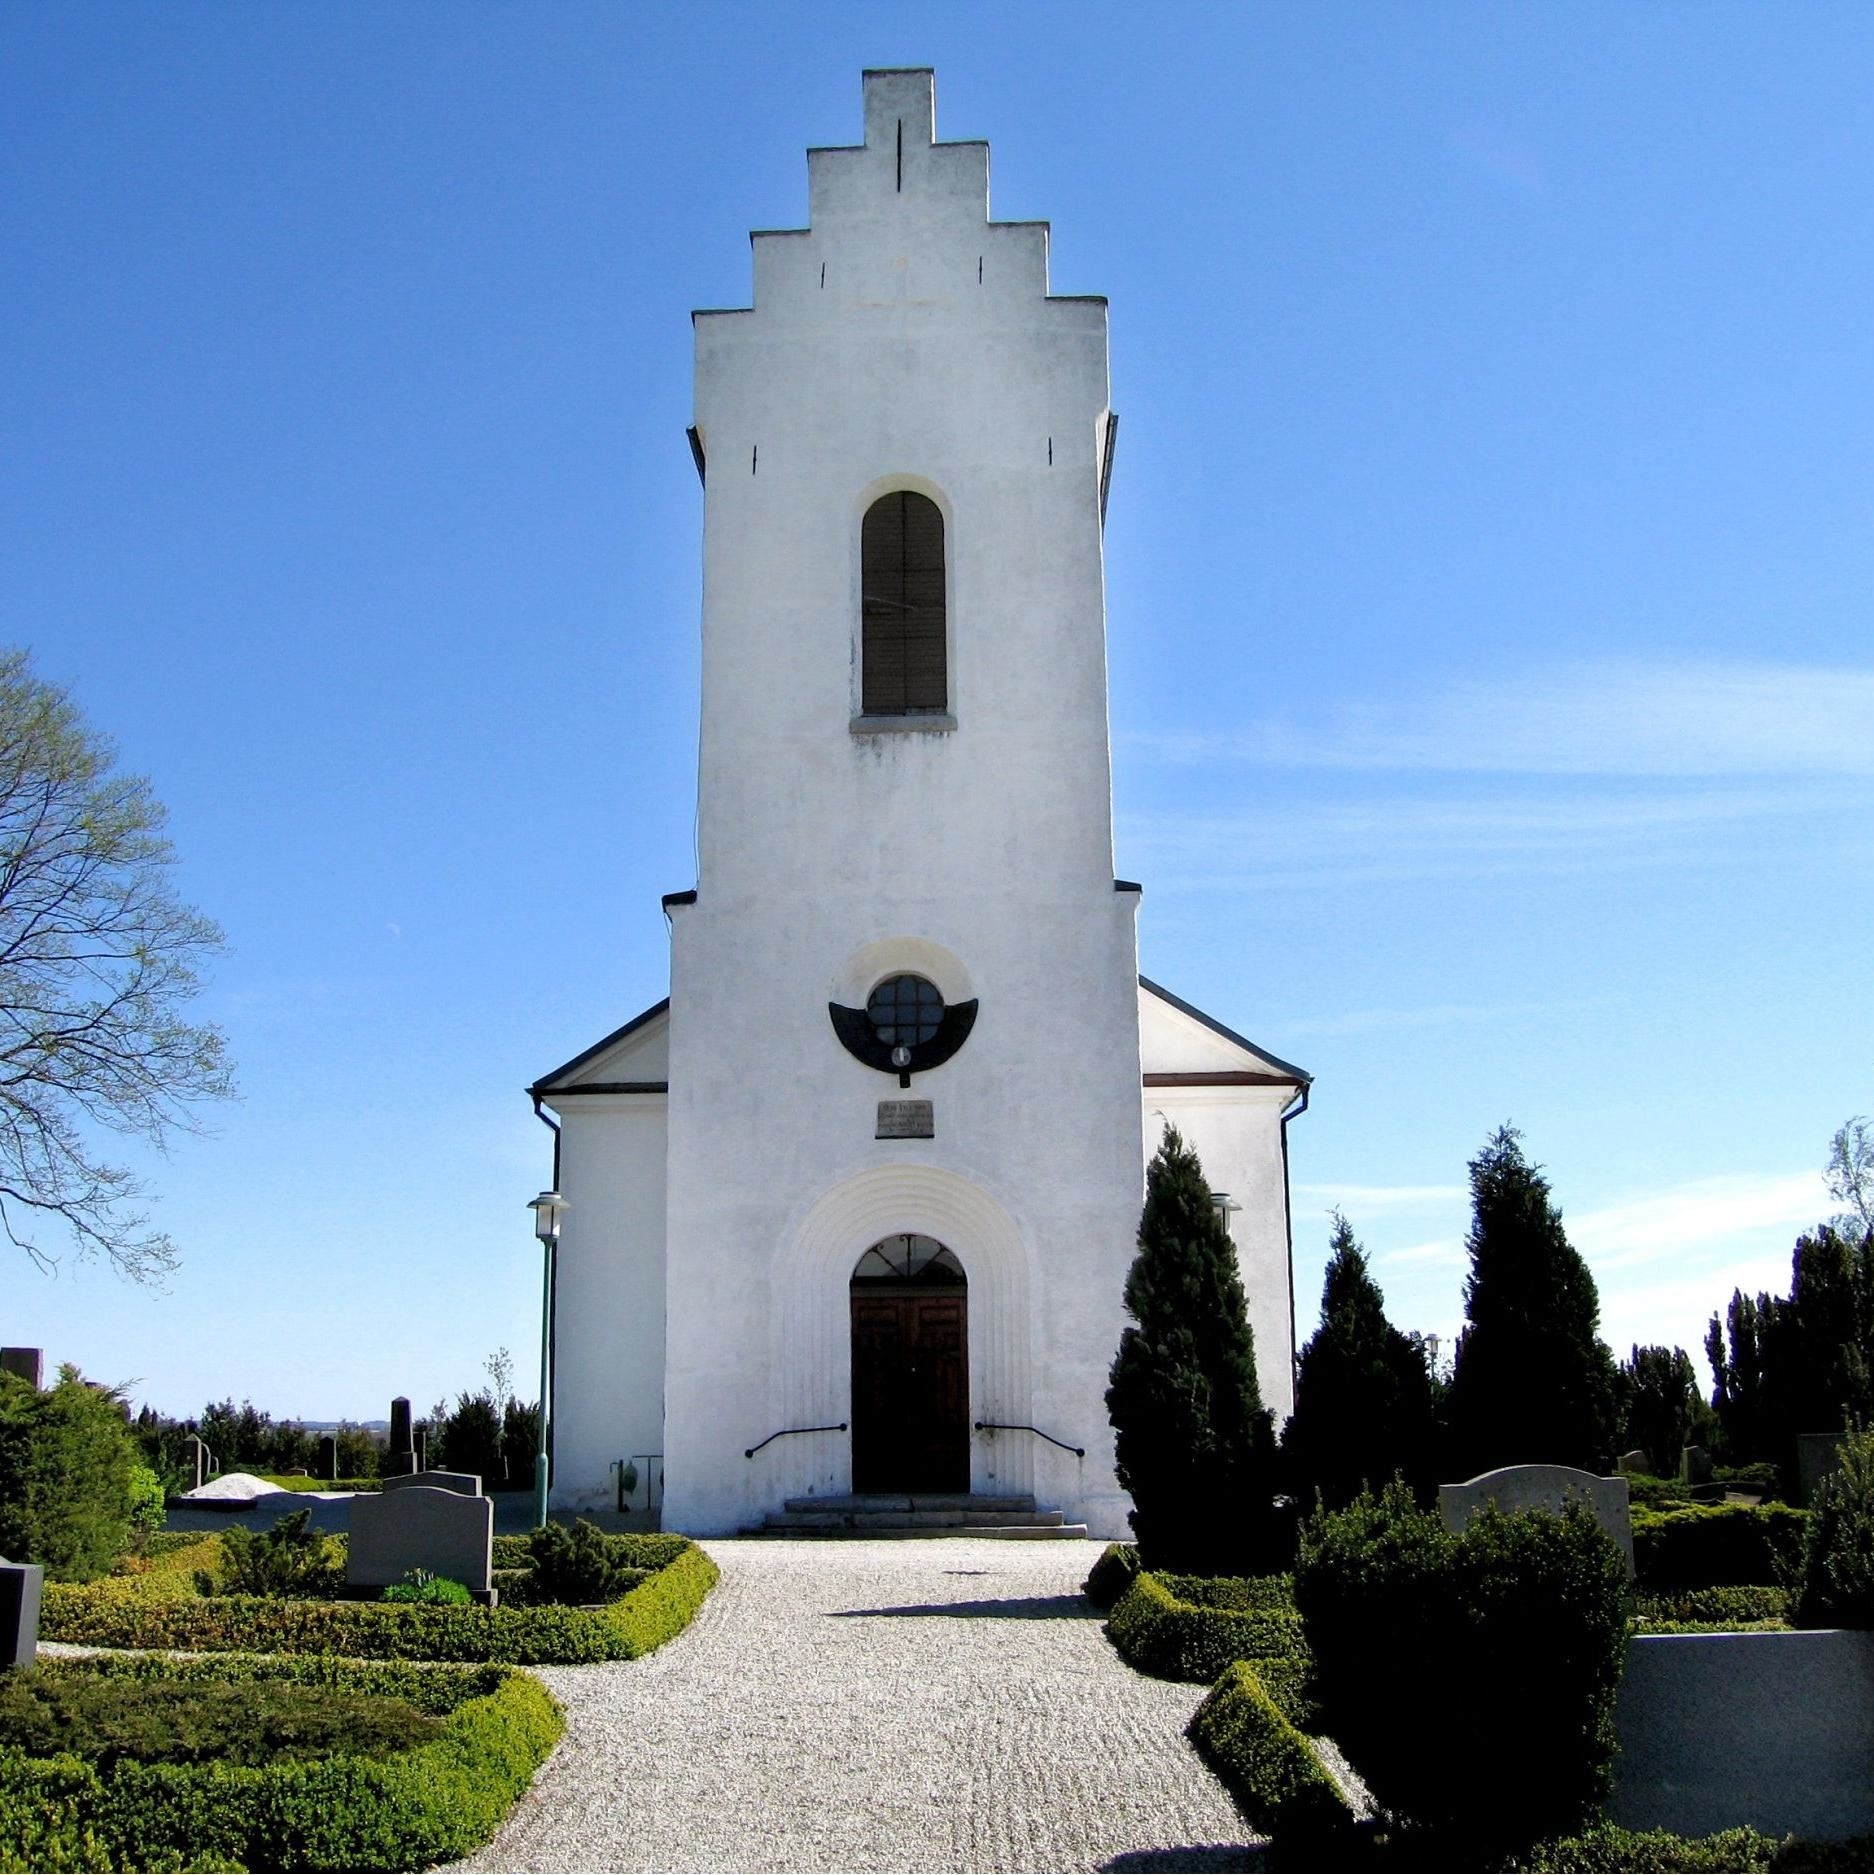 Dagstorps church